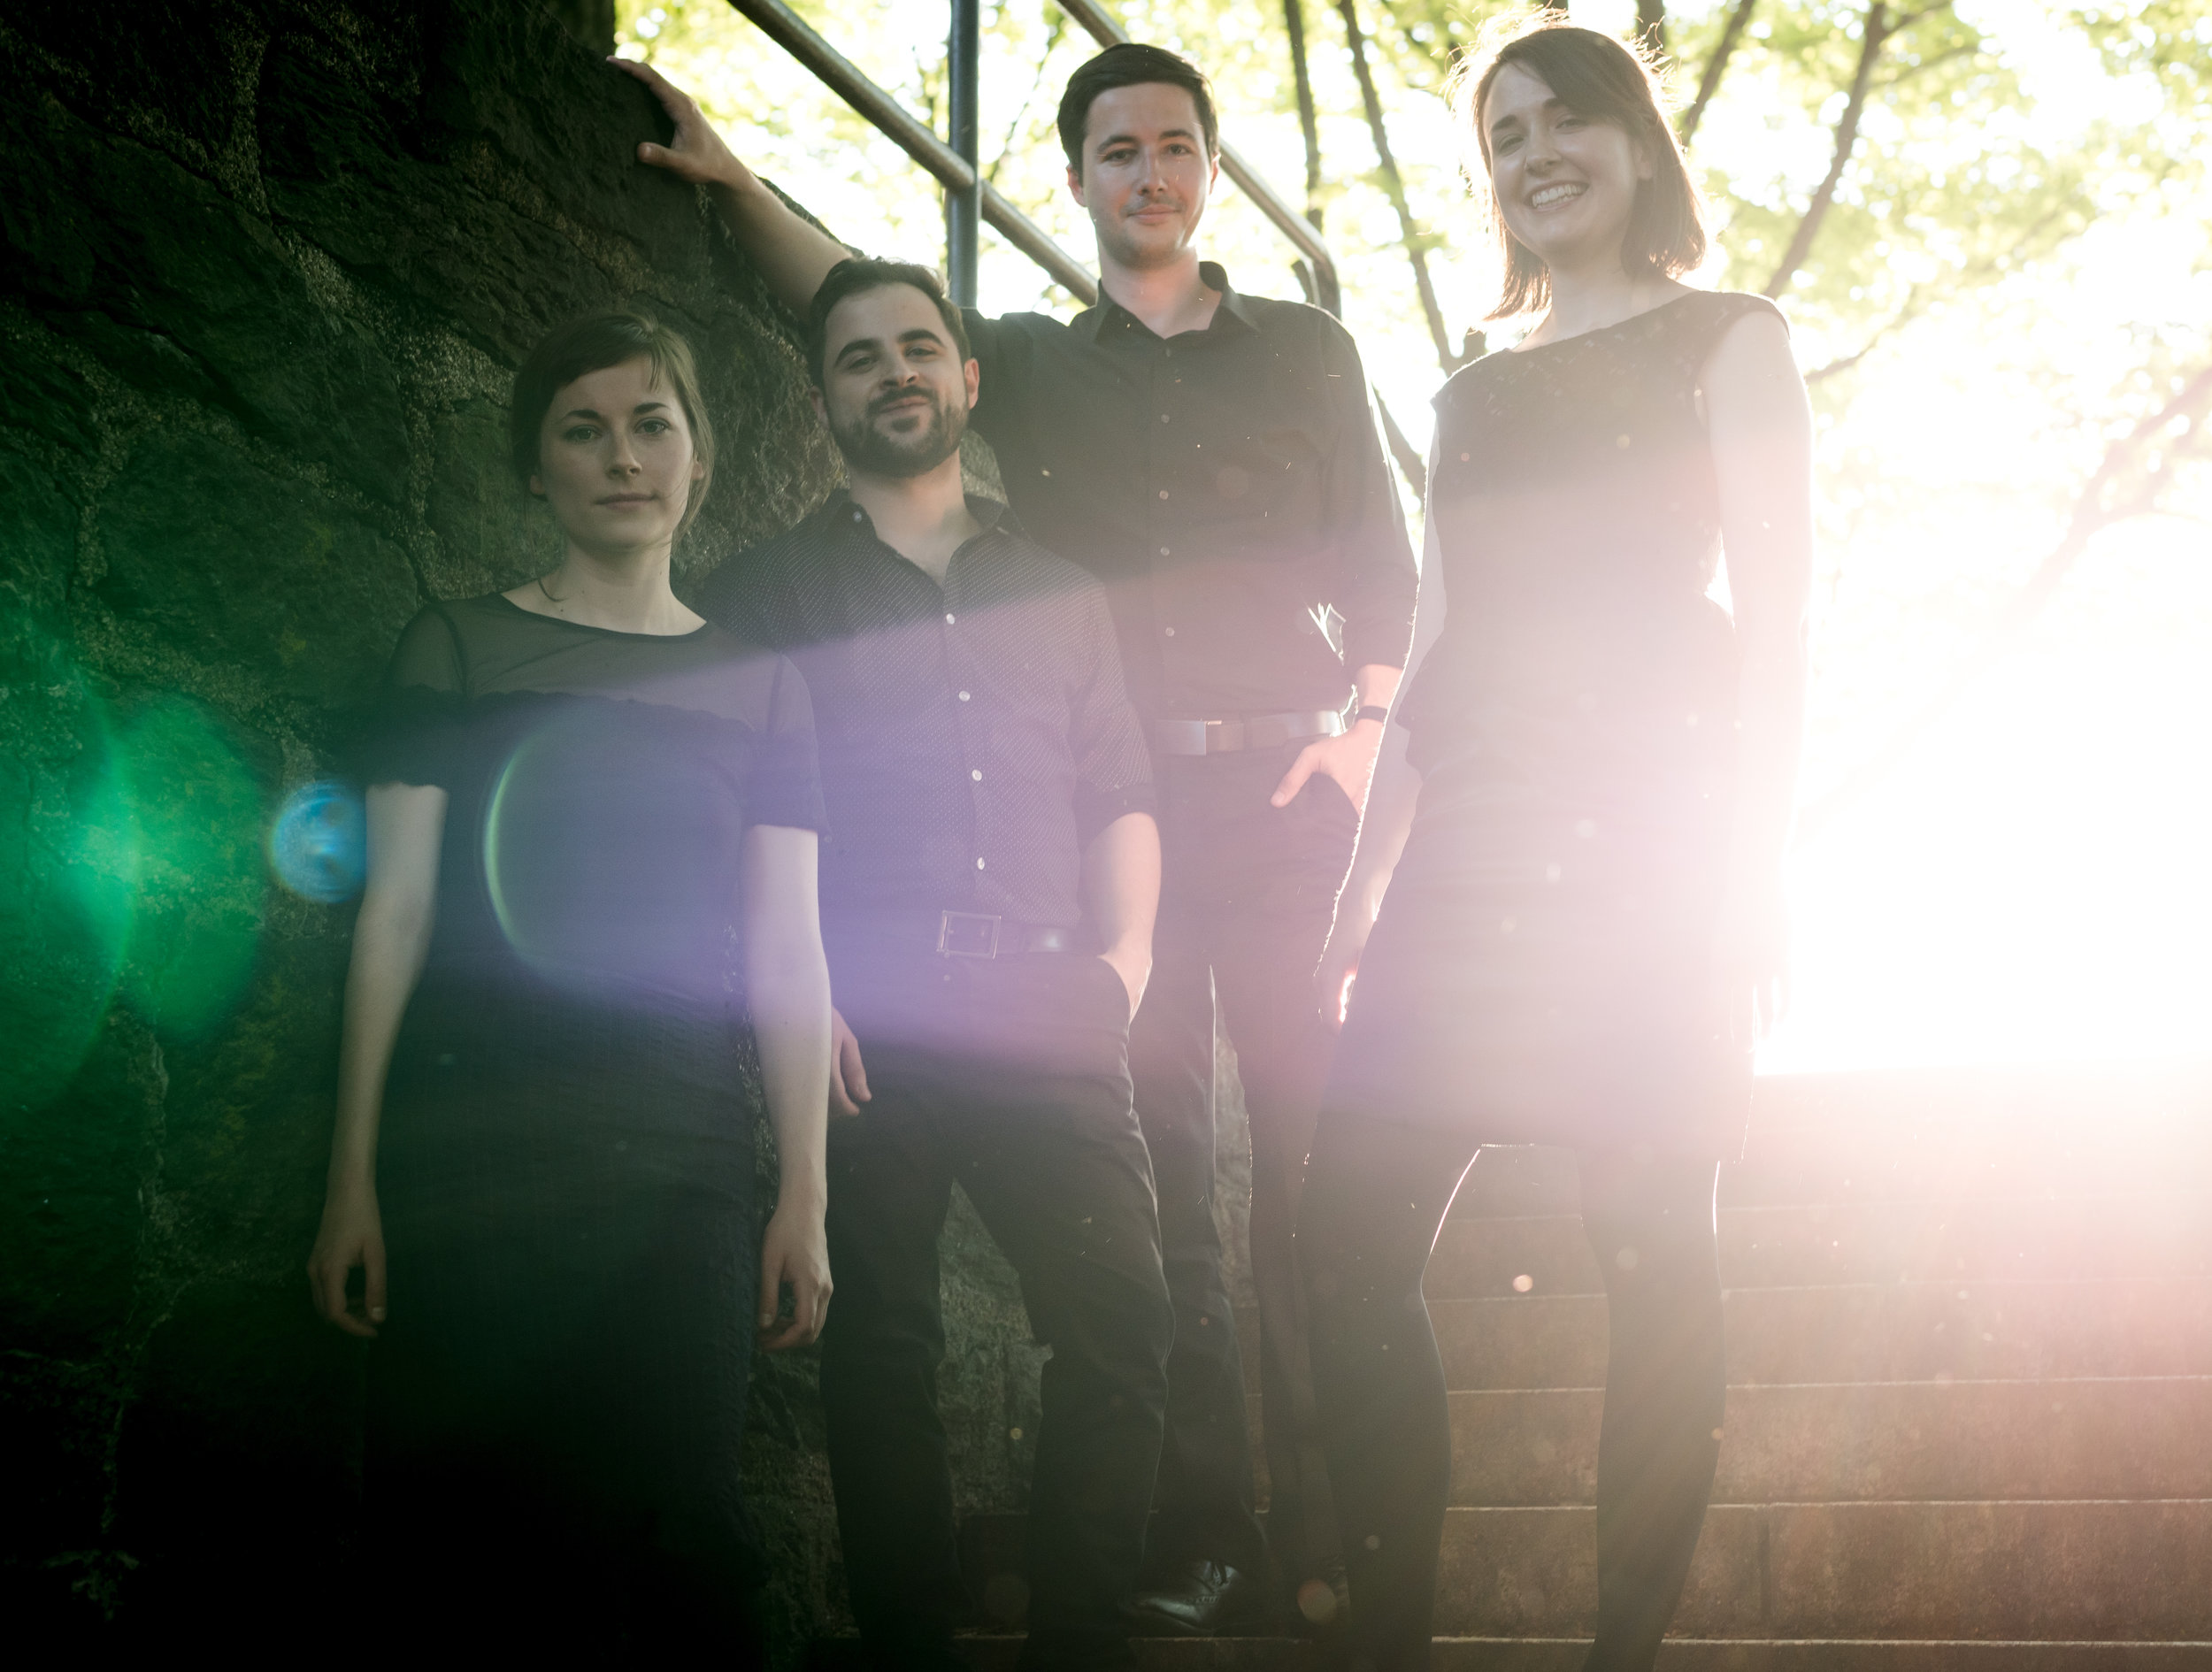 Puck Quartet at the final performance of the 2015 Robert Mann String Quartet Institute, Manhattan School of Music